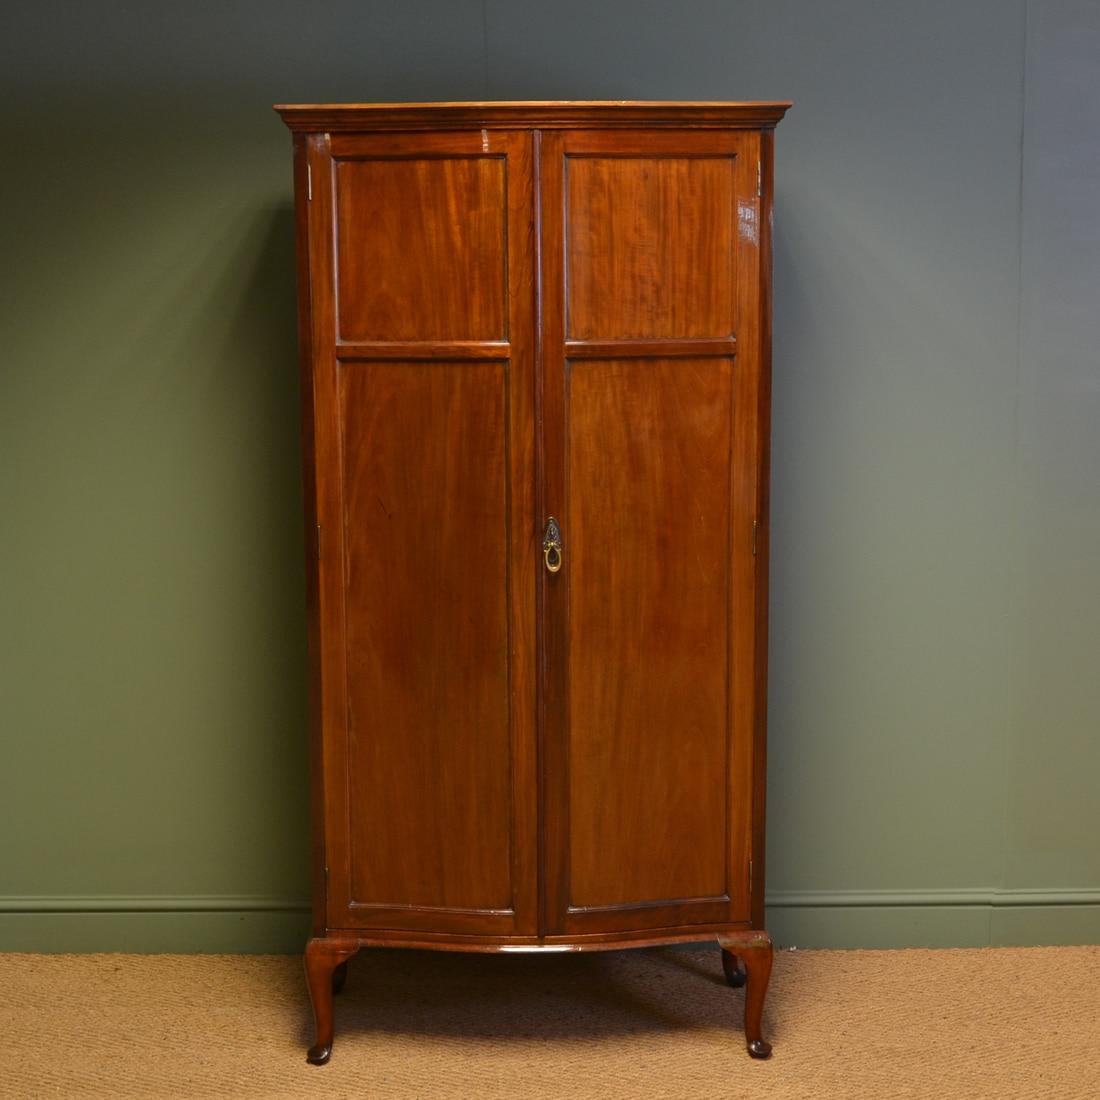 Spectacular Druce & Co Edwardian Antique Walnut Small Serpentine Wardrobe